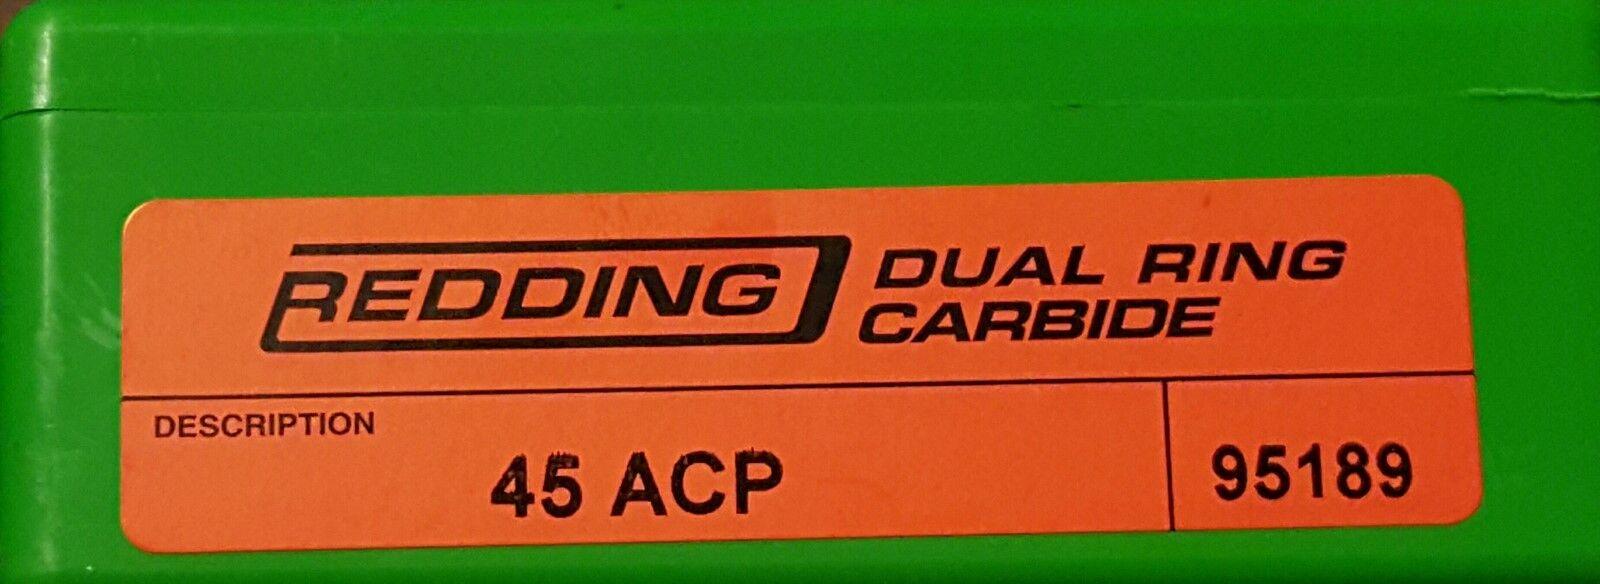 95189 REDDING 45 ACP DUAL RING CARBIDE SIZER - NEW - FREE SHIPPING